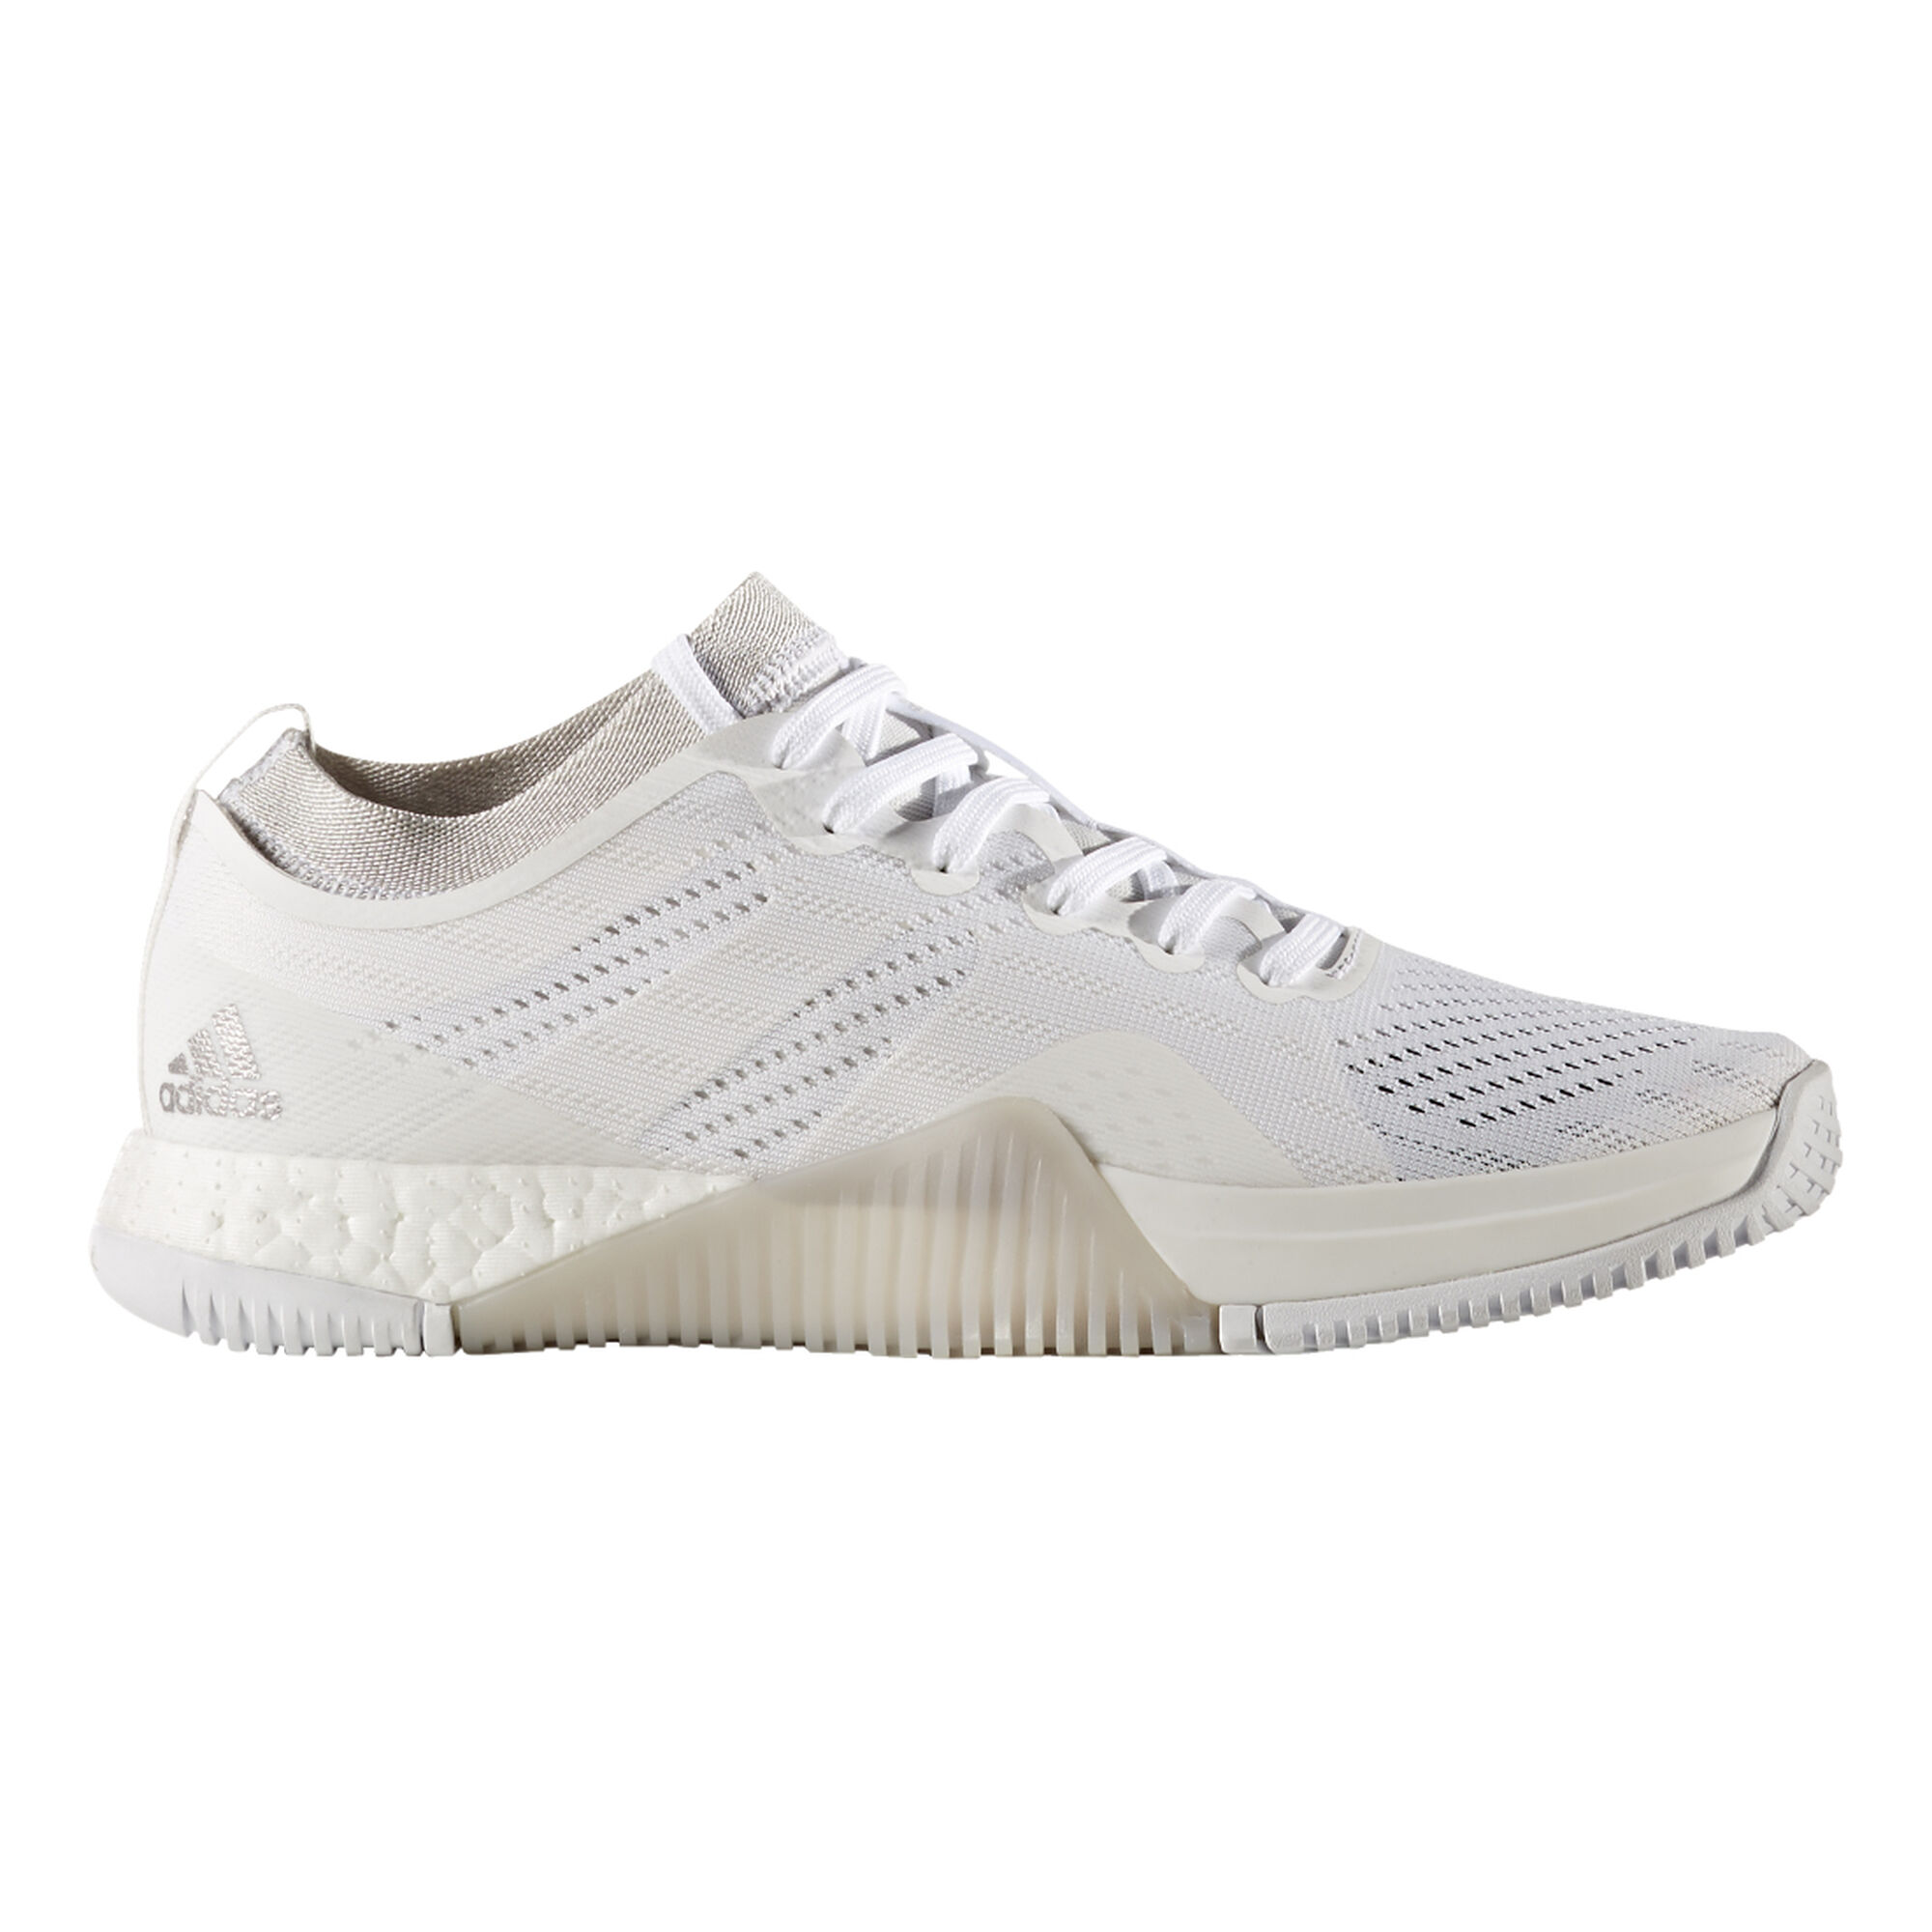 75007a039f5 adidas · adidas · adidas · adidas · adidas · adidas · adidas · adidas ·  adidas. CrazyTrain Elite Women ...